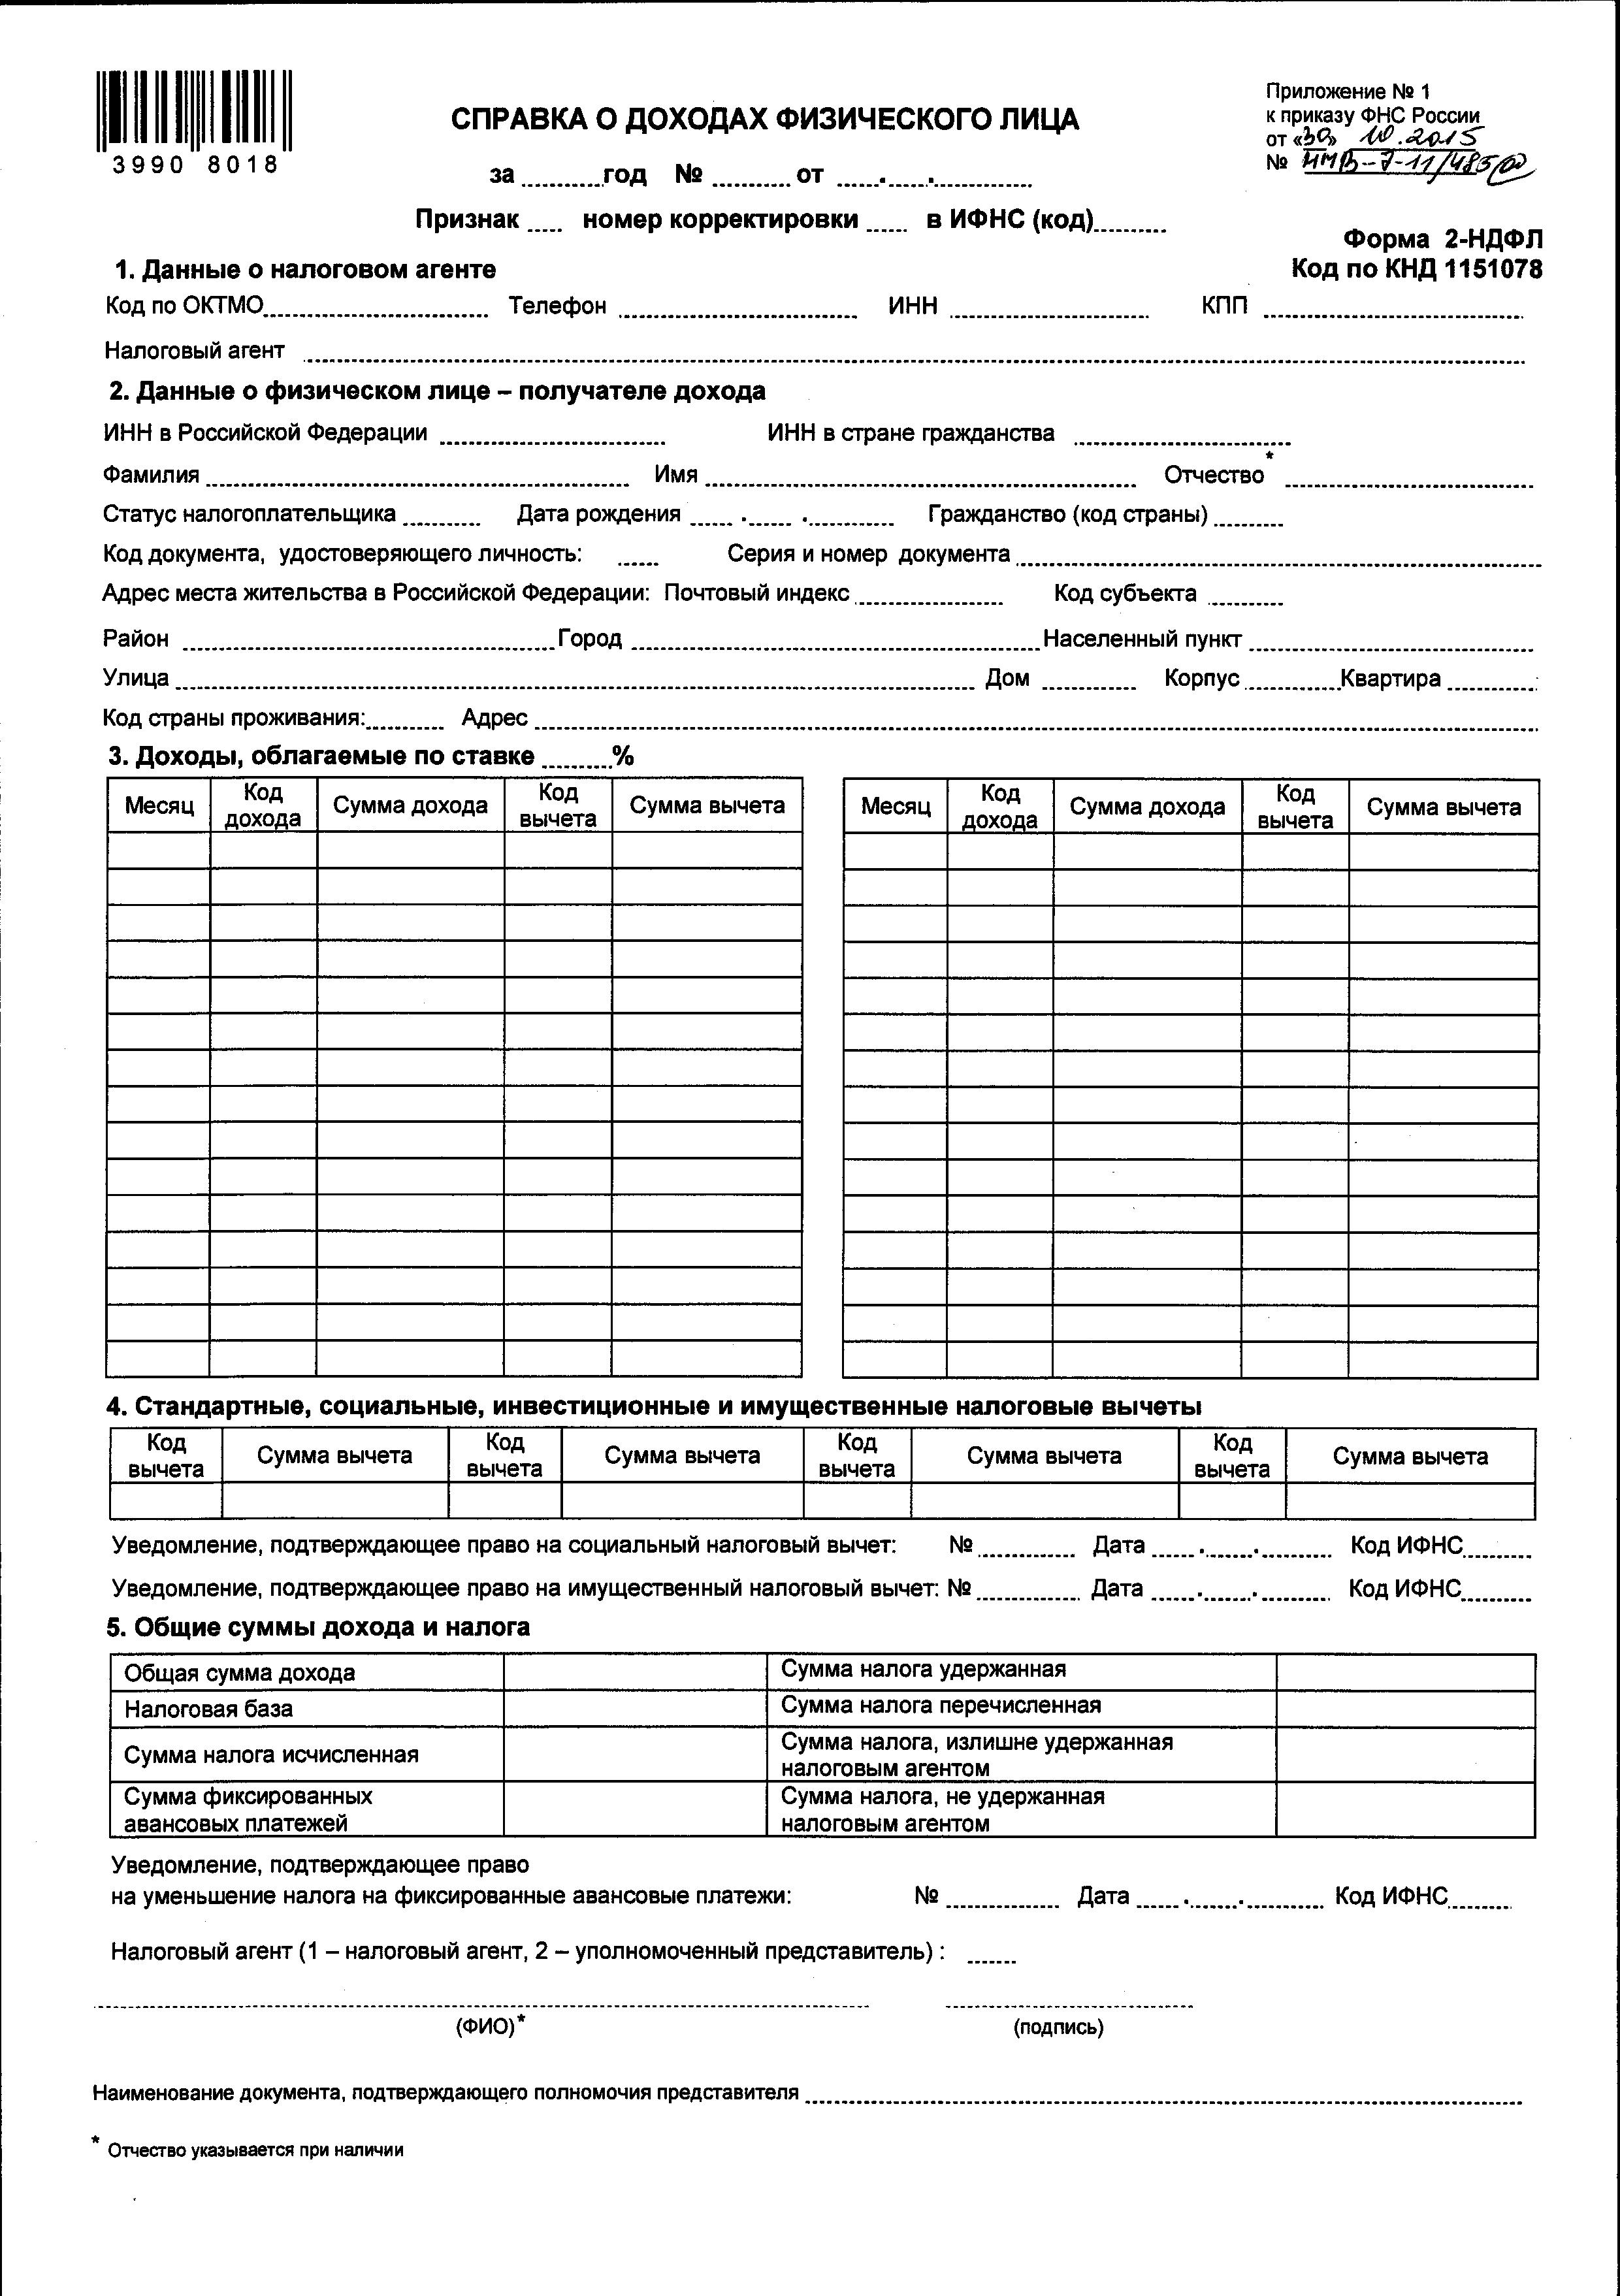 бланк заявления на субсидии жкх